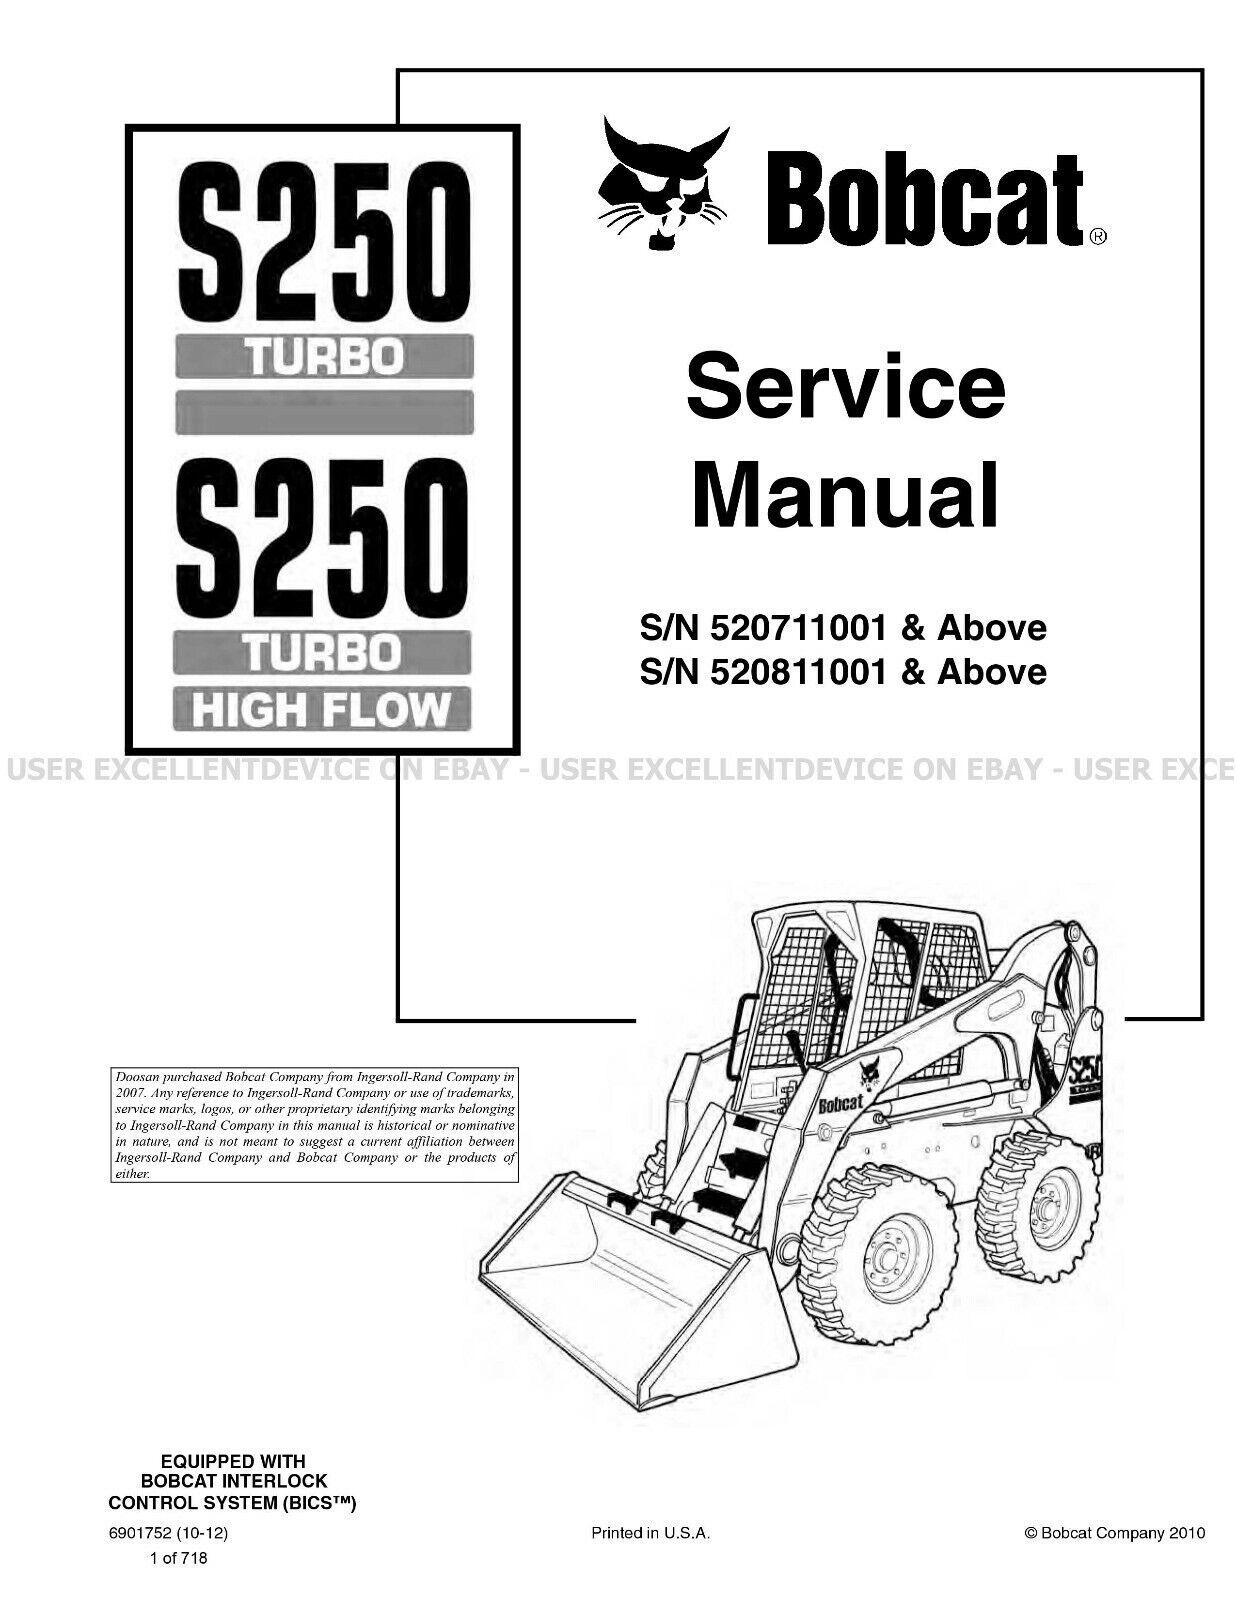 Bobcat S250 Turbo Highflow Skid Steer Printed Service